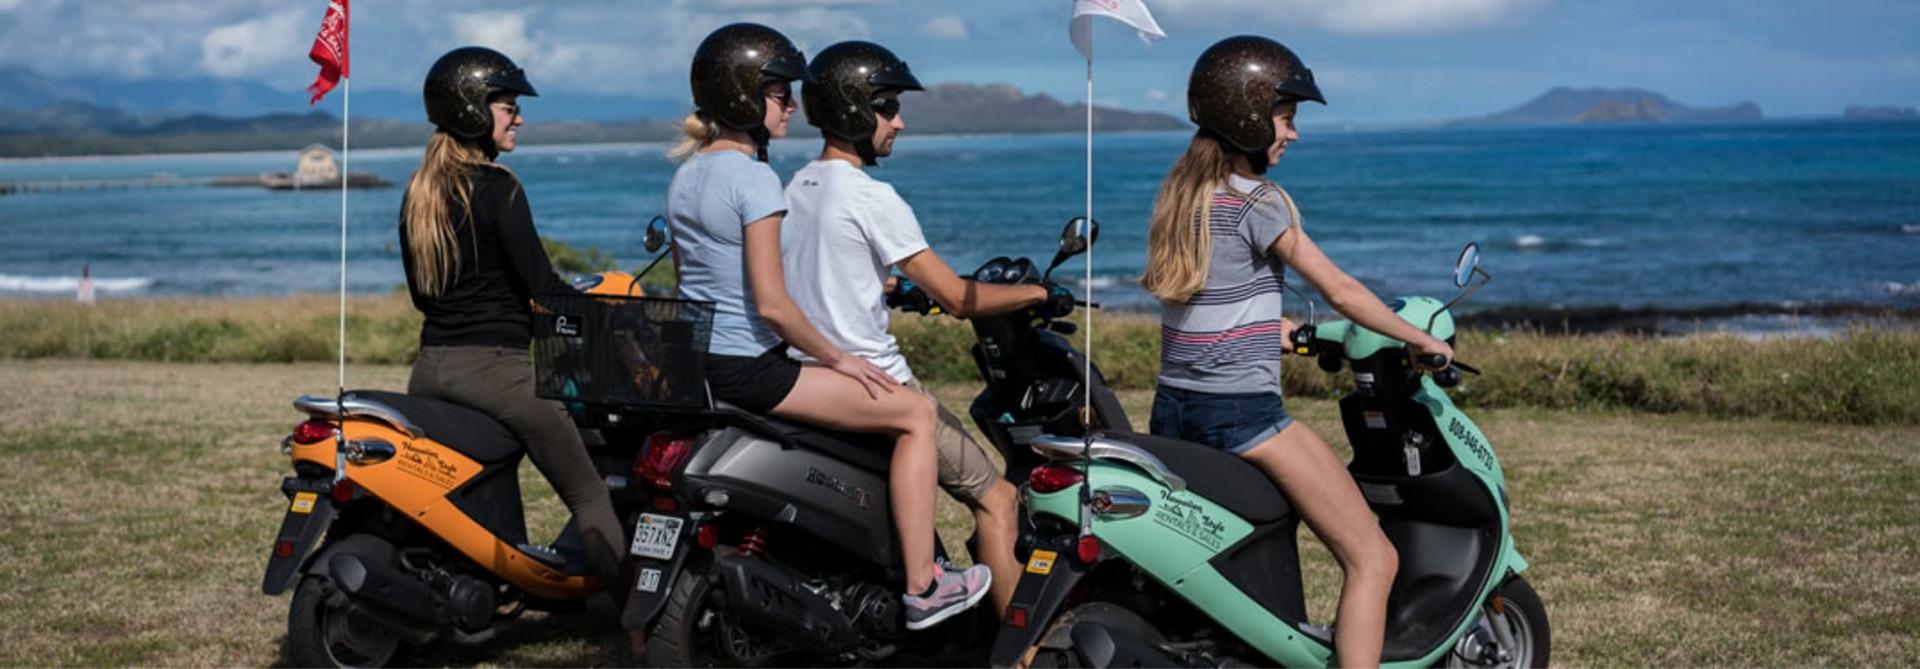 moped-header-16